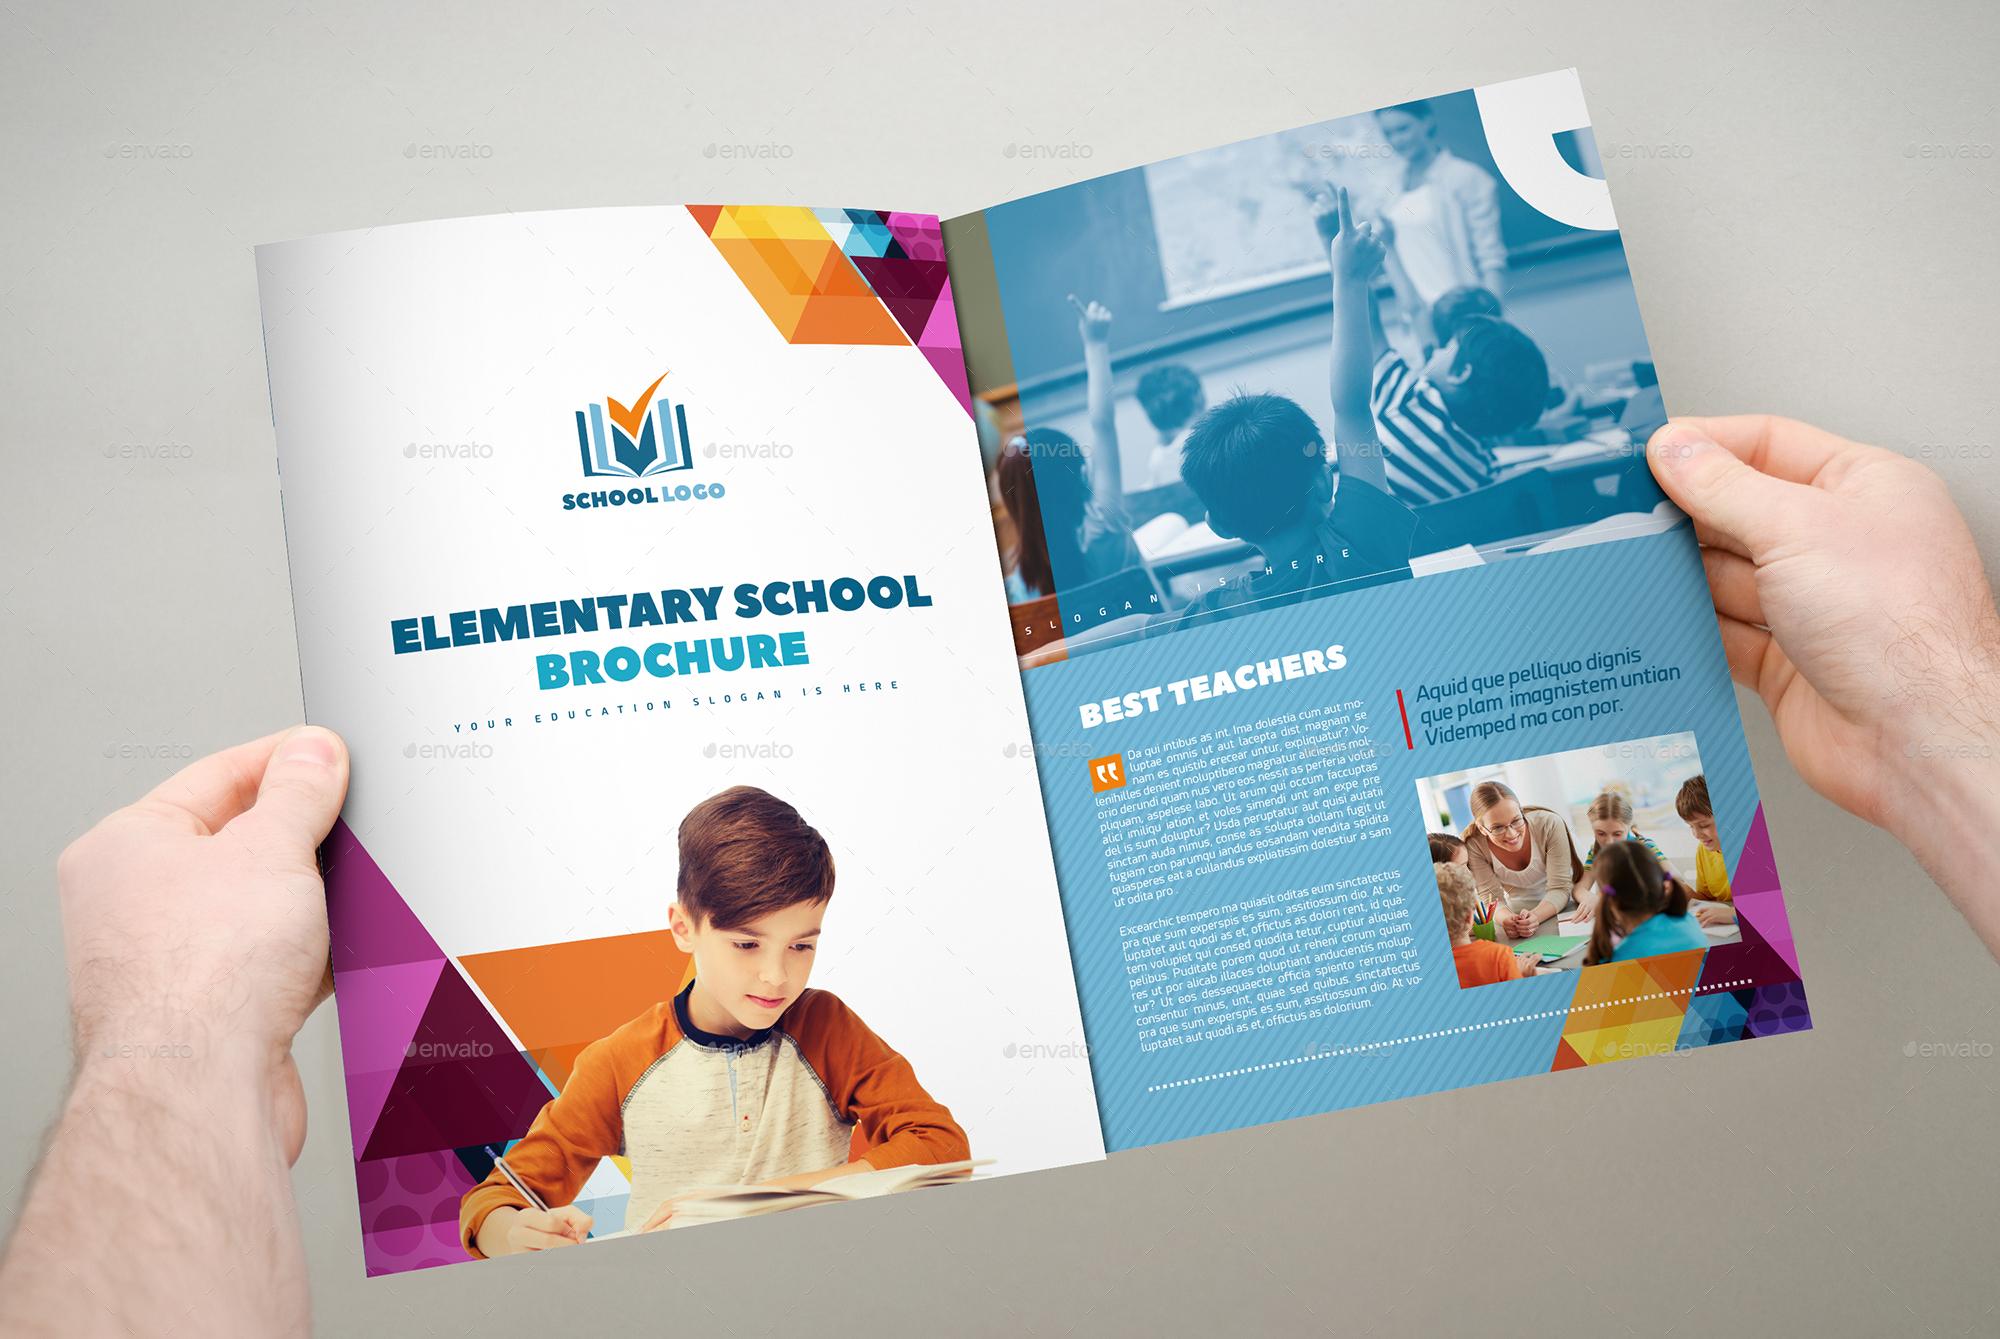 XA TriFold School Multipurpose Brochure Template By Interado - School brochure template